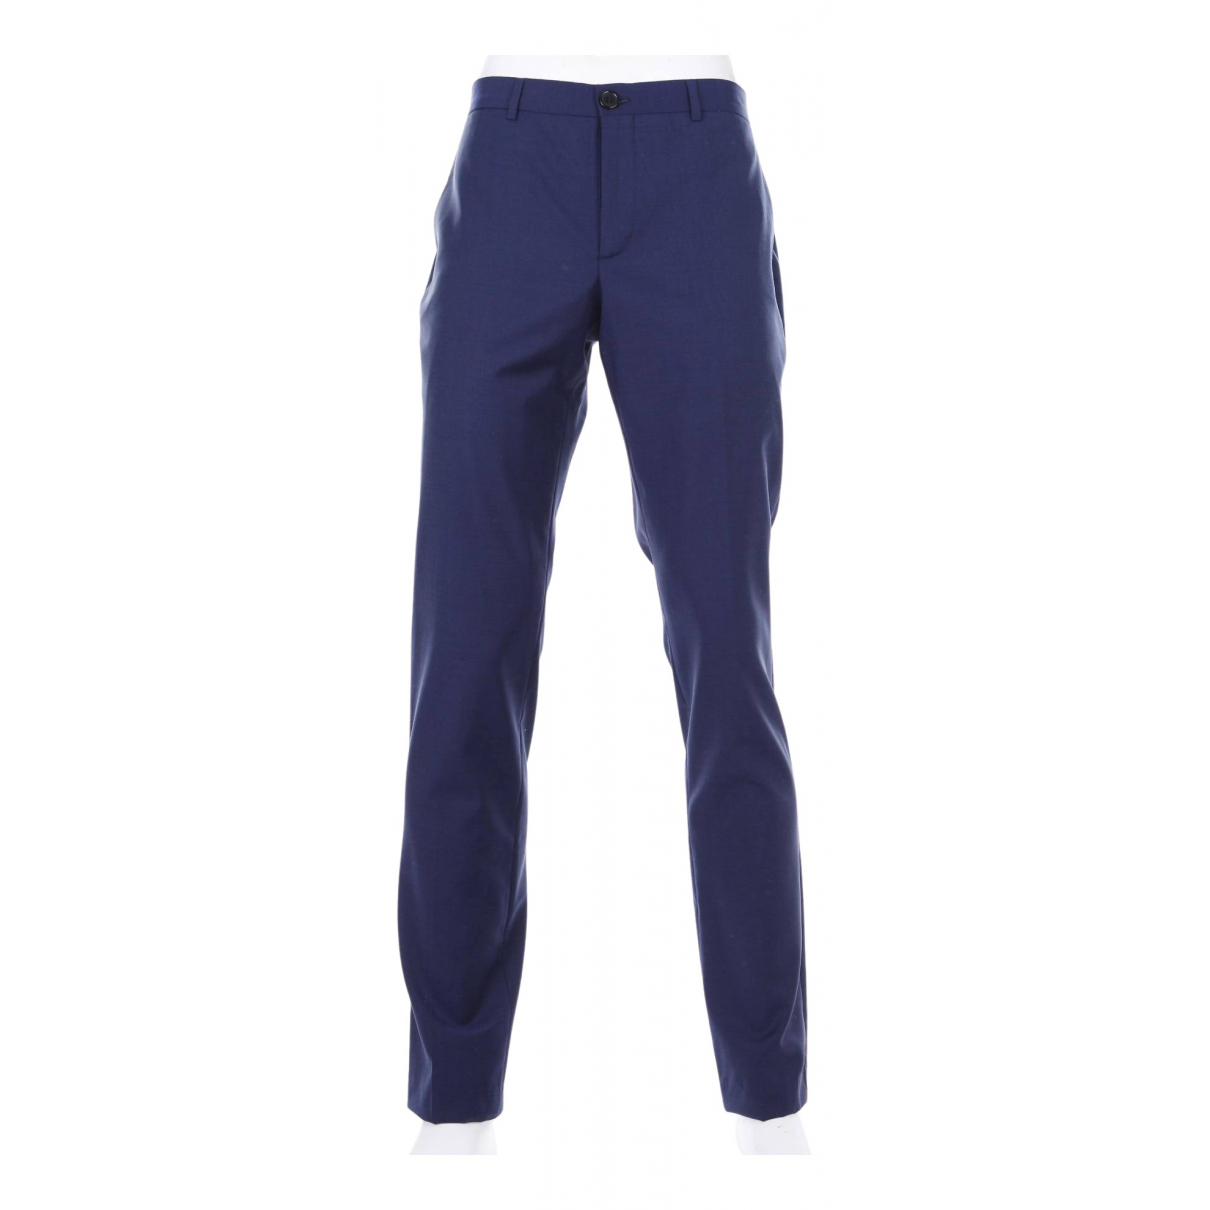 Pantalon de Lino Paul Smith